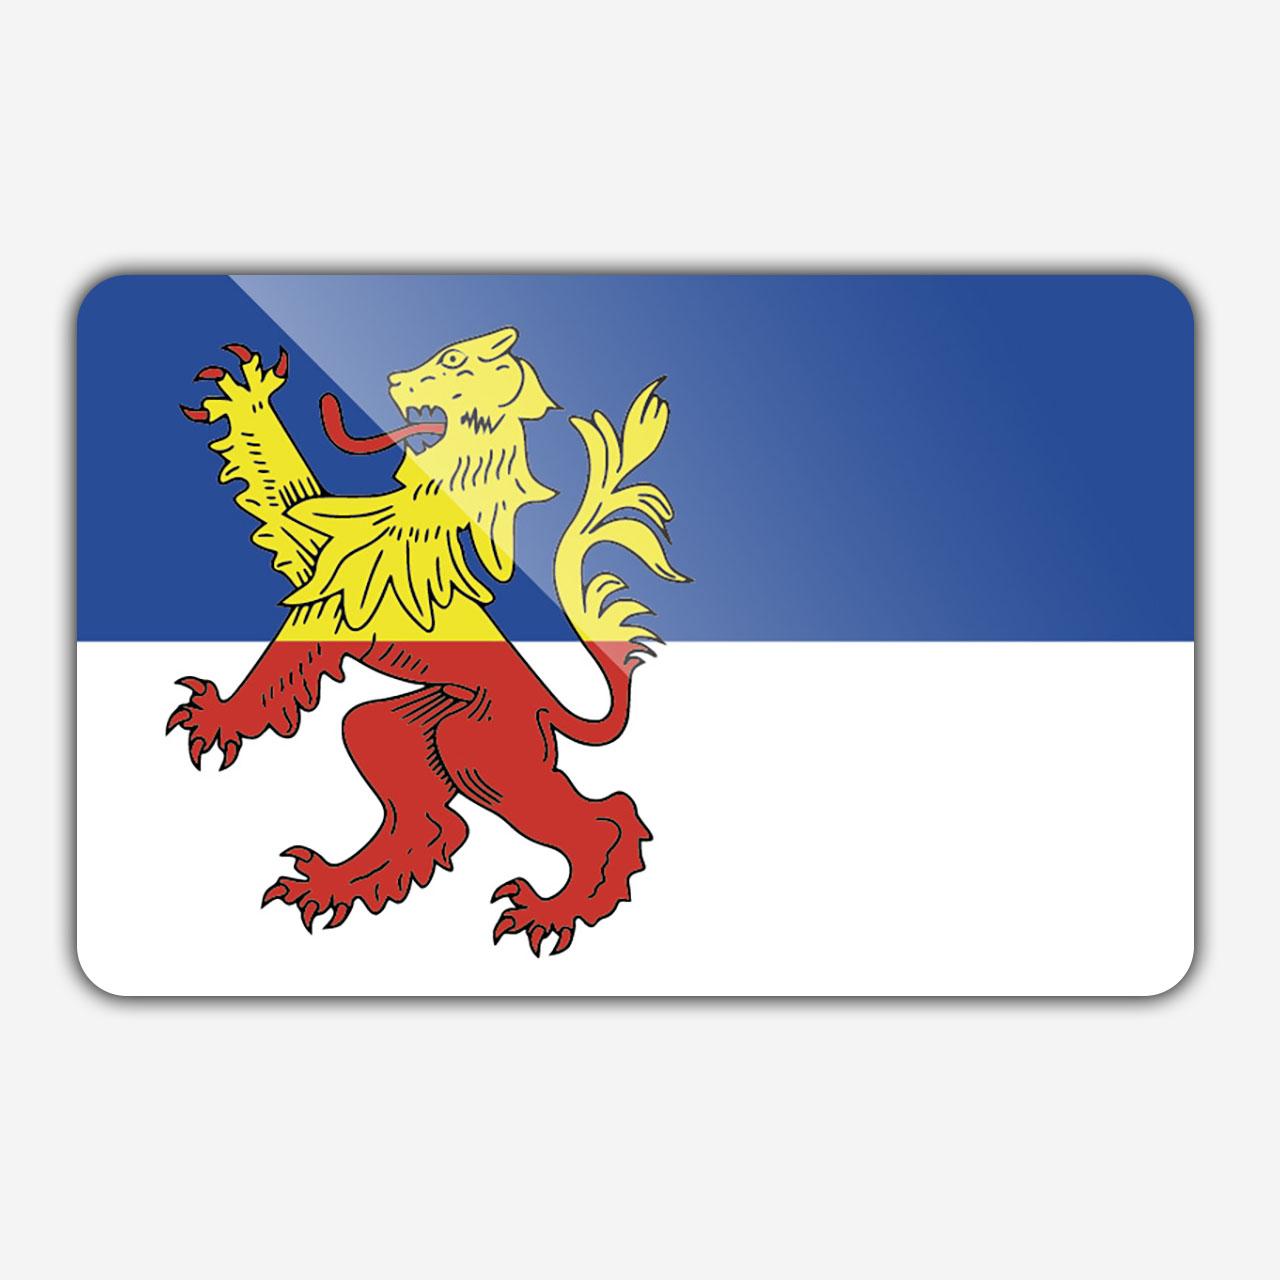 Vlag gemeente Neder-Betuwe